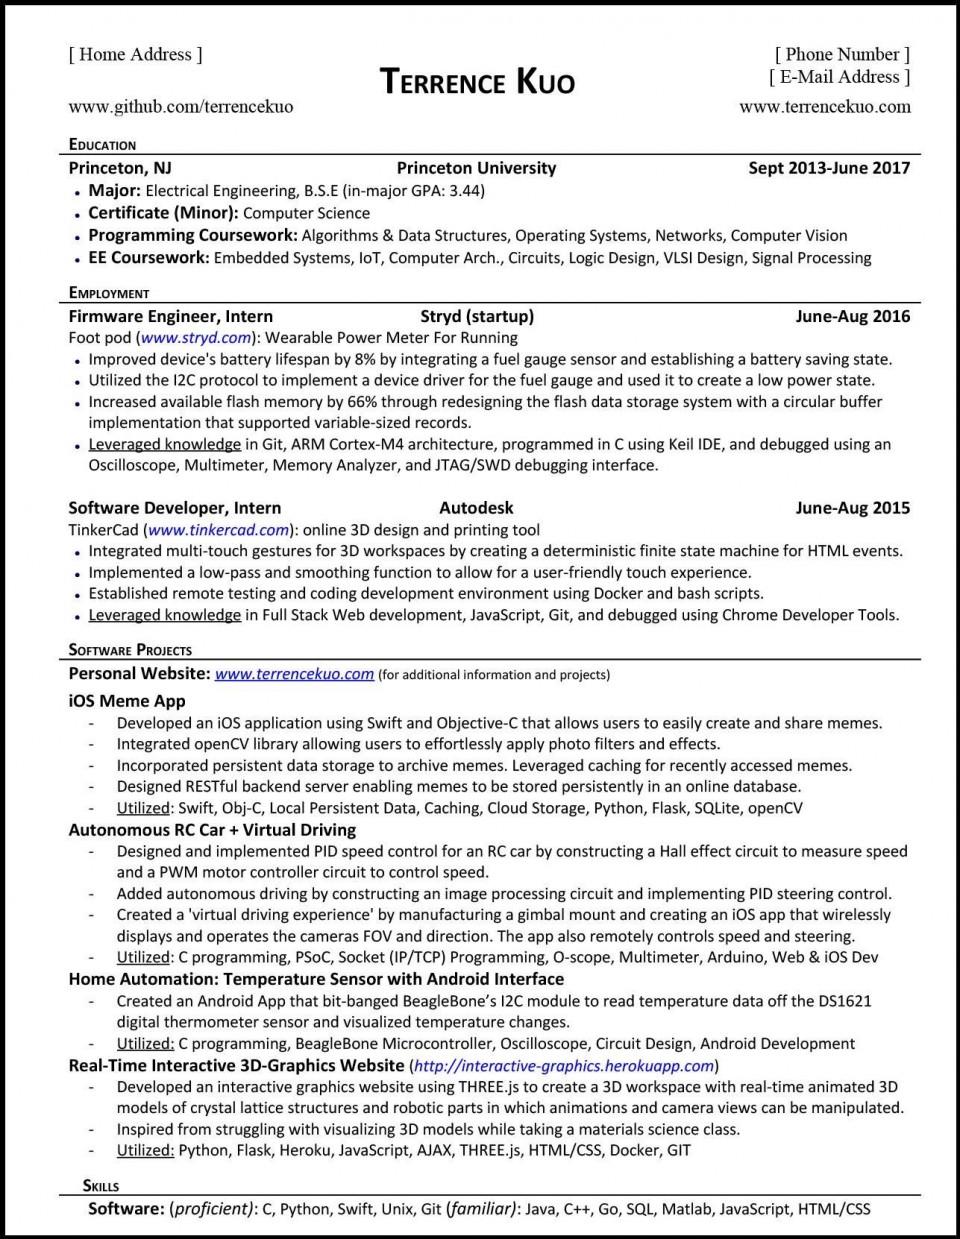 000 Top Software Engineering Resume Template High Resolution  Engineer Microsoft Word Cv Free Developer Download960